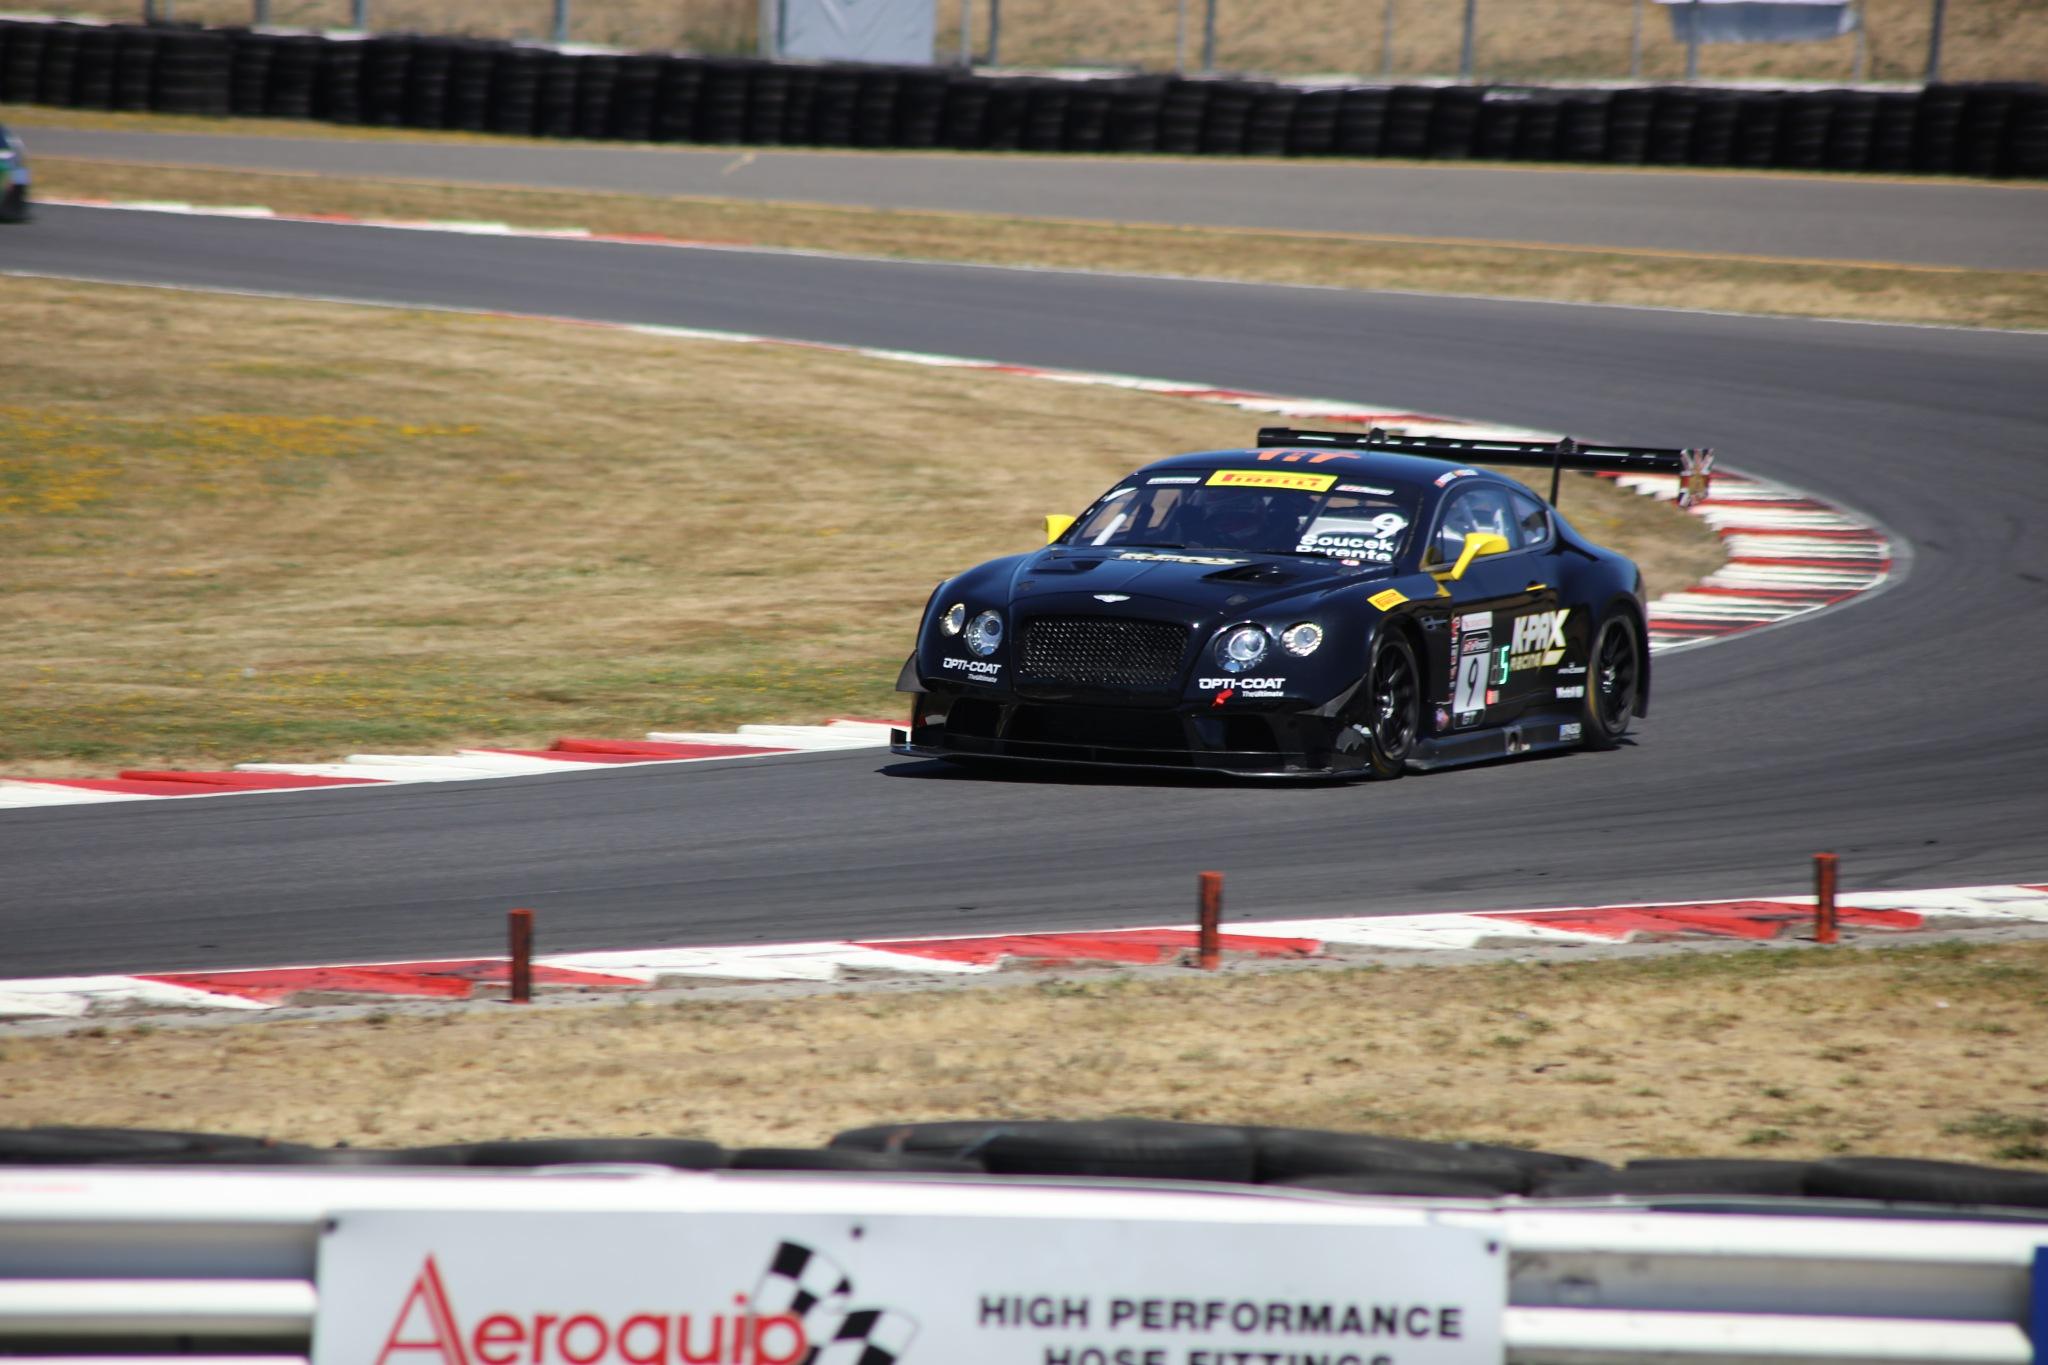 Bentley Race car by richard.klaus.900